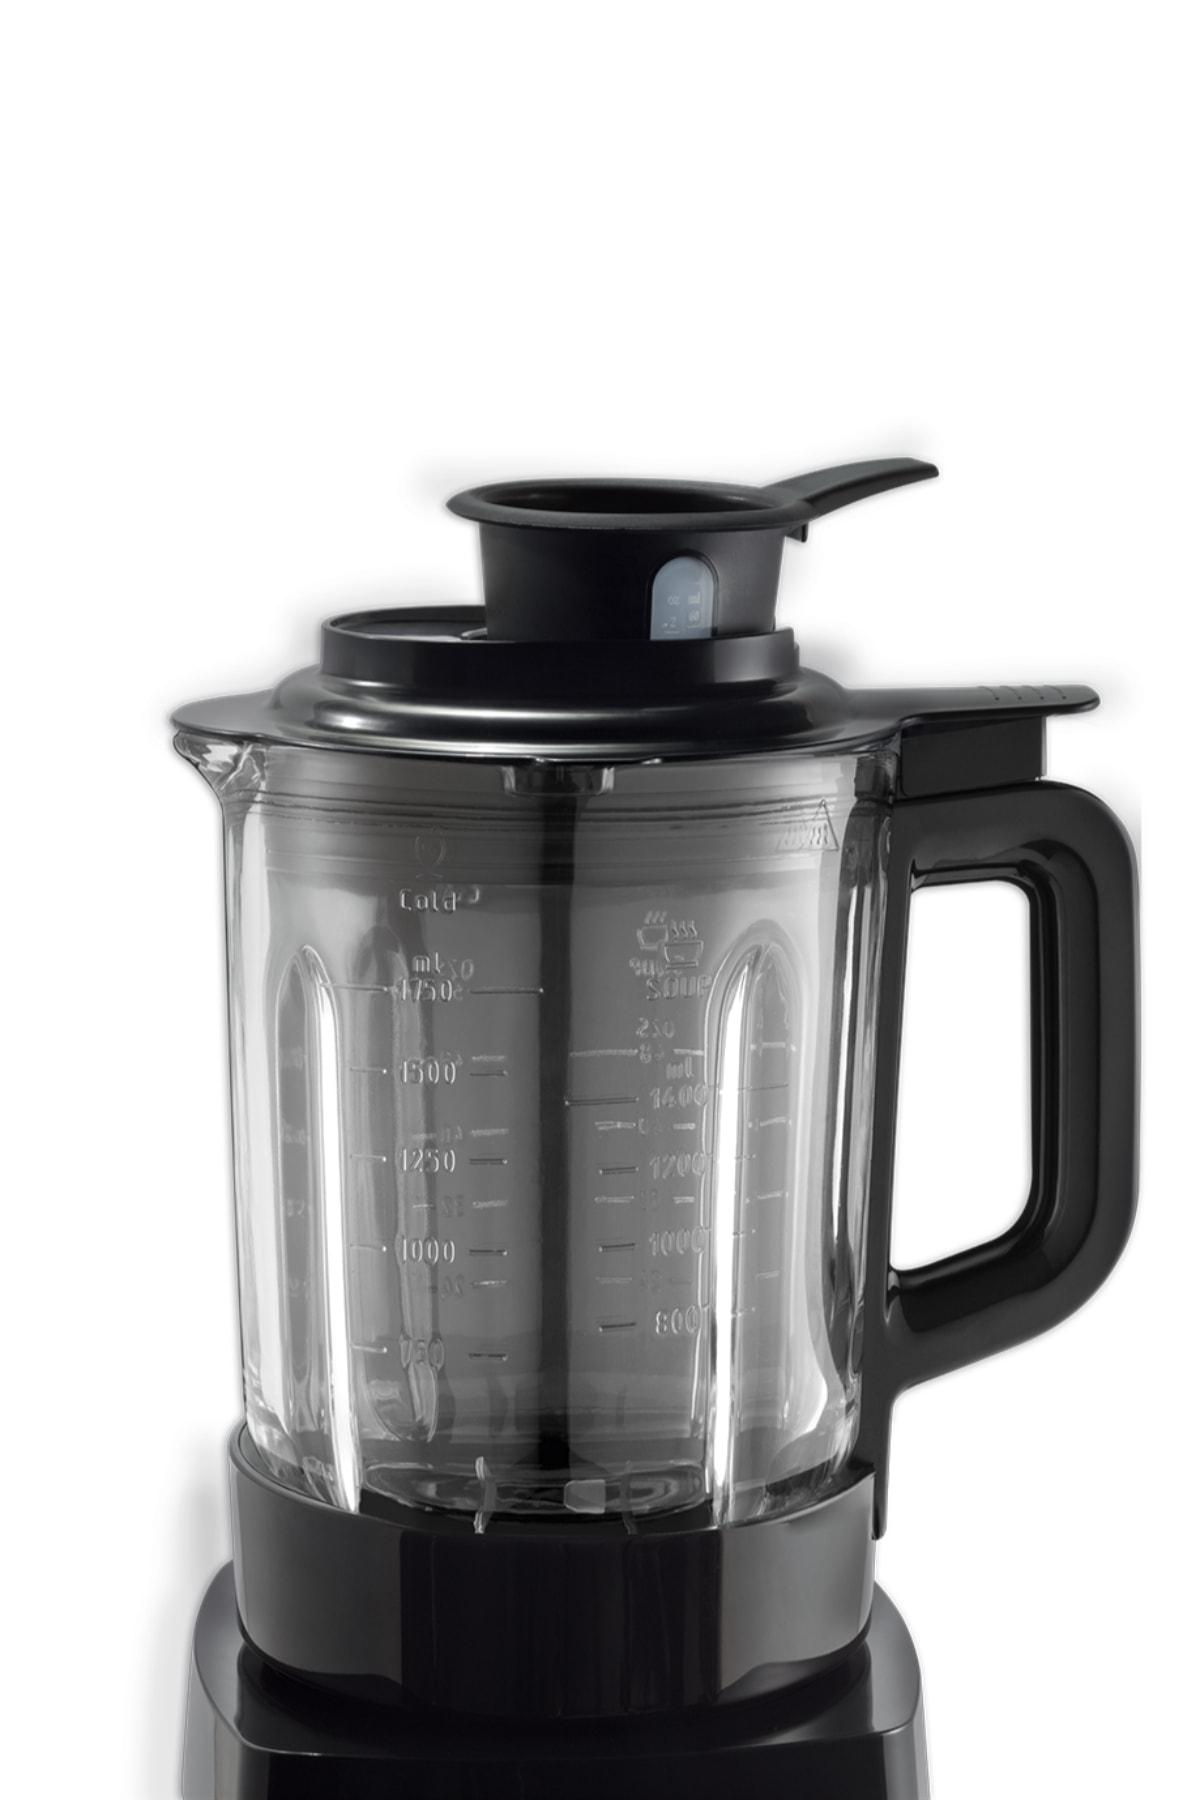 Grundig CB 8760 Professional Line Soup Maker ve Blender - Çorba Makinesi 2